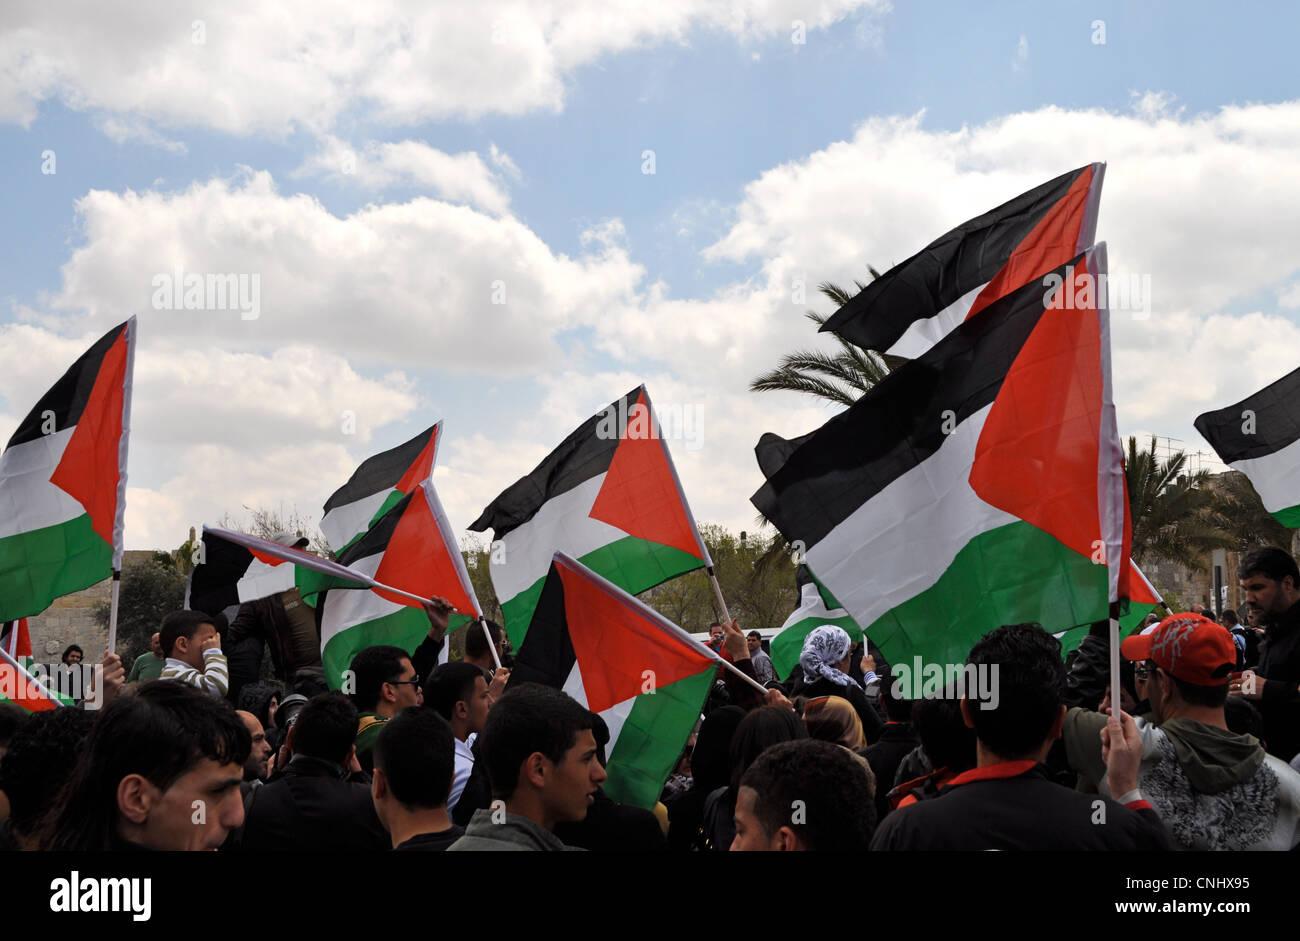 Palestinian Land Day demonstration 2012, Damascus Gate, West Bank, Jerusalem Old City turned violent. Palestinian - Stock Image